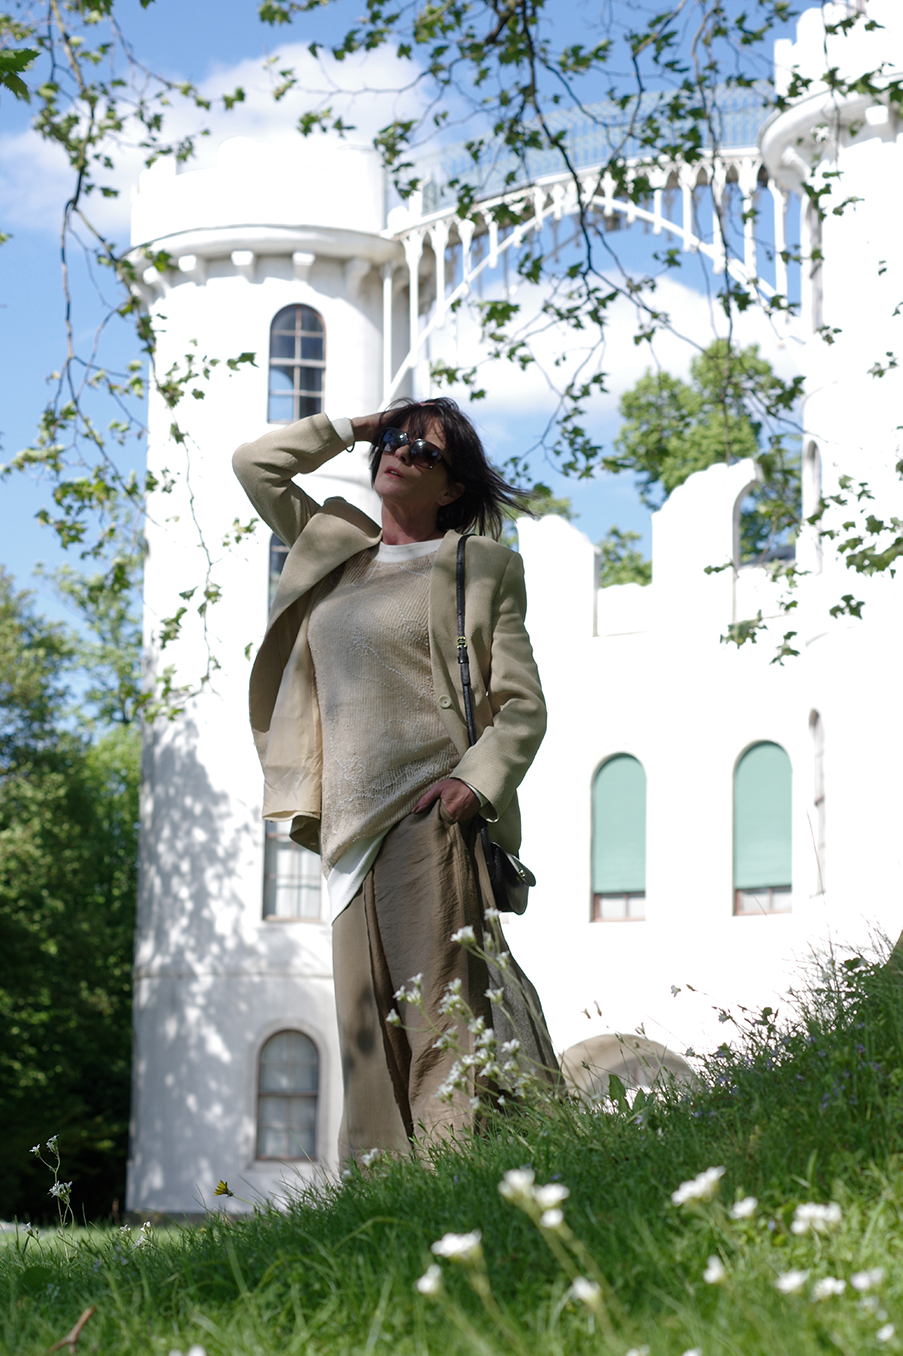 Just-take-a-look Berlin - Outfit - Romantik - Pfaueninsel 35